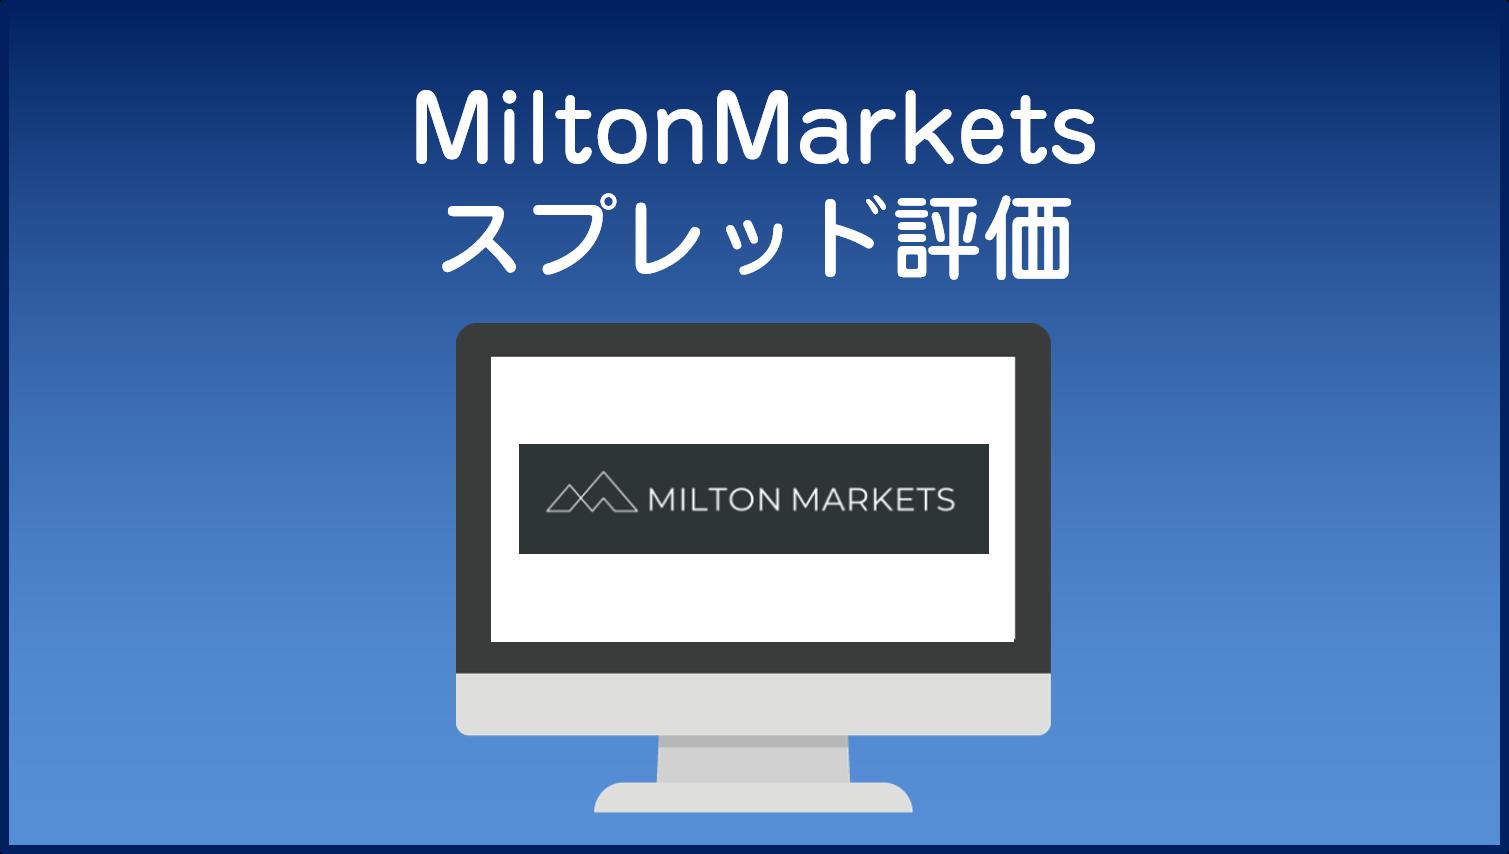 MiltonMarketsスプレッド評価